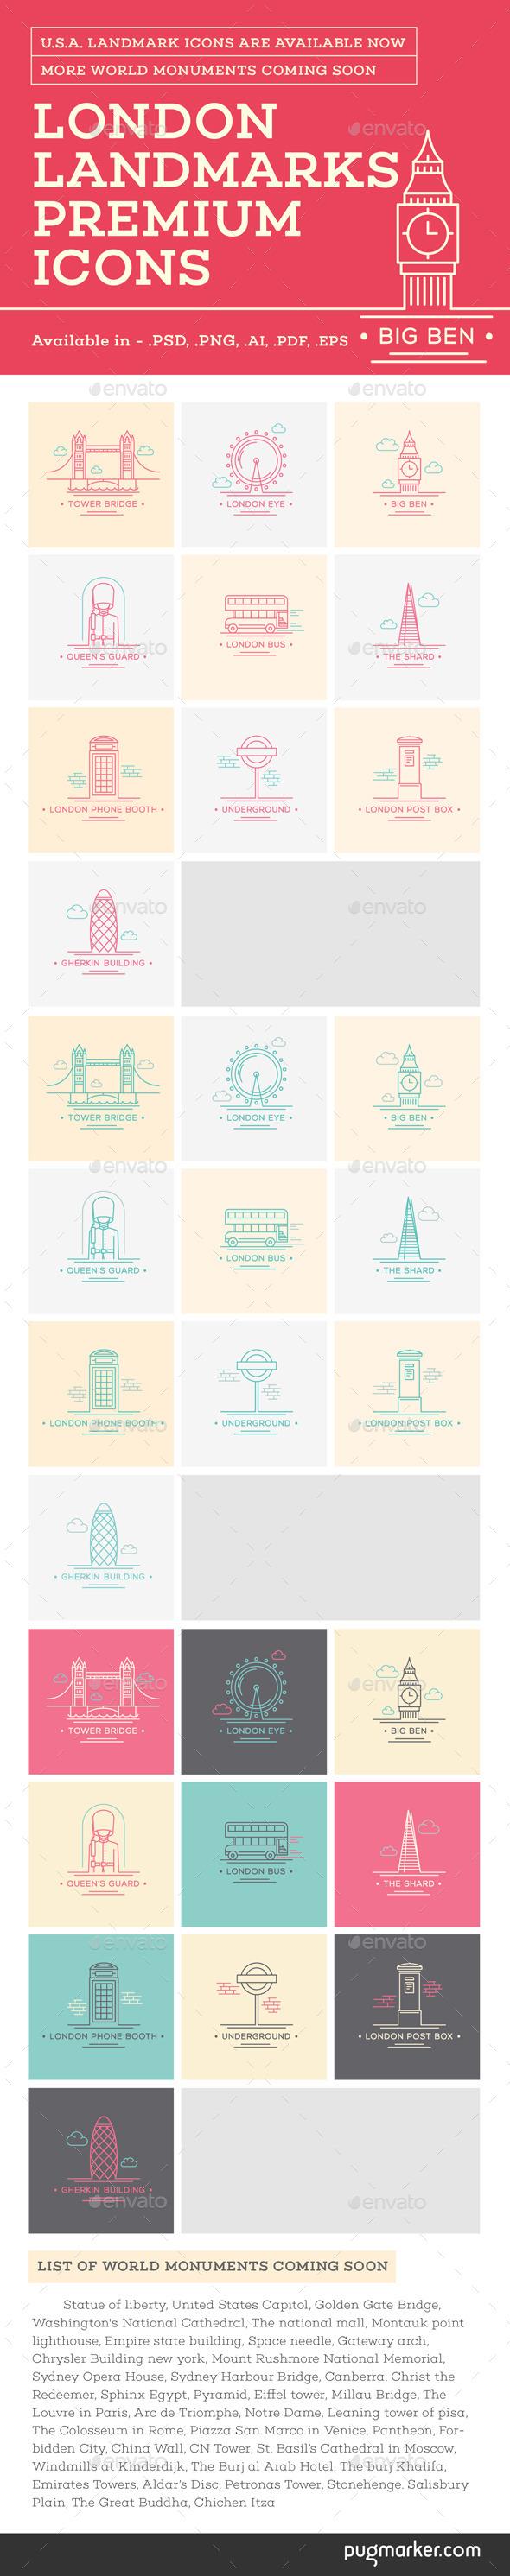 World Landmark Icons - Vol. 3 (London) - Man-made objects Objects